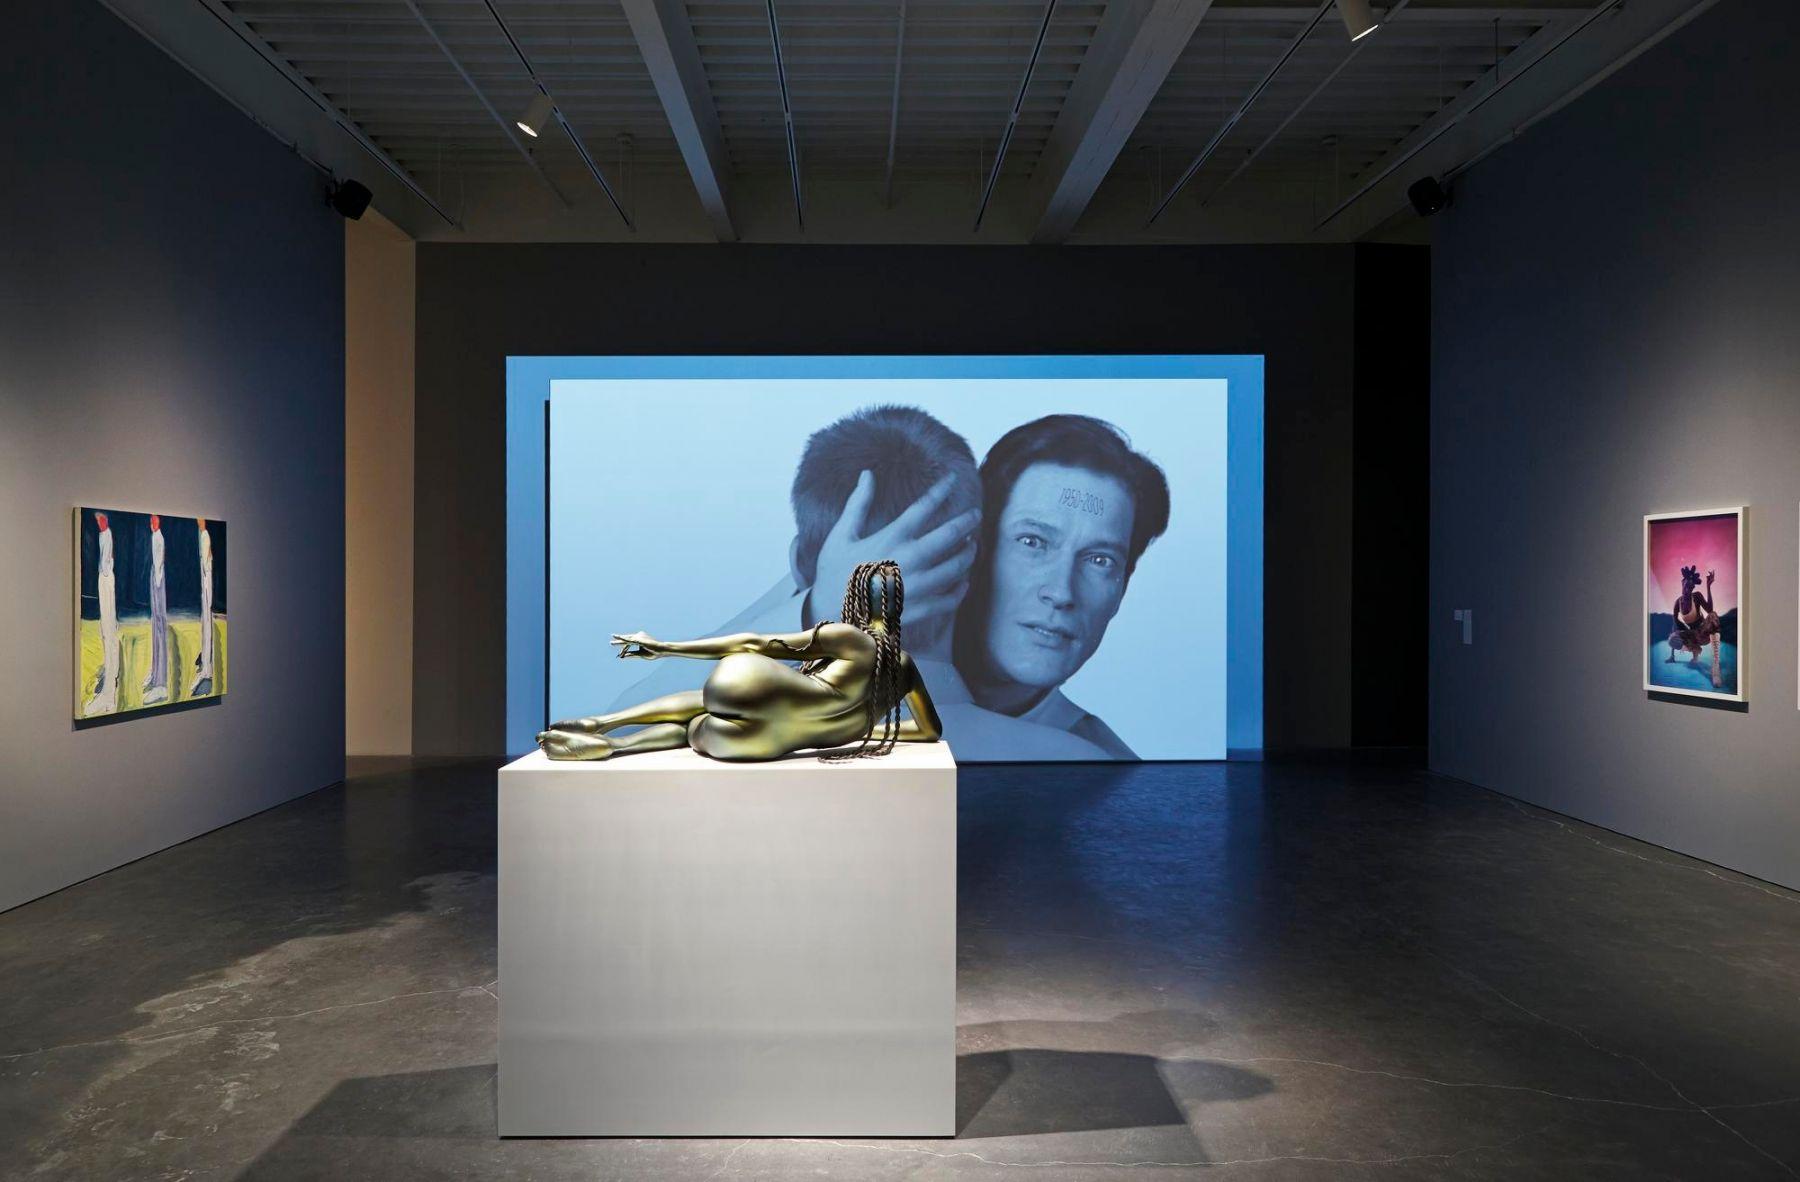 New Museum 2015 Triennial installation views, 2015